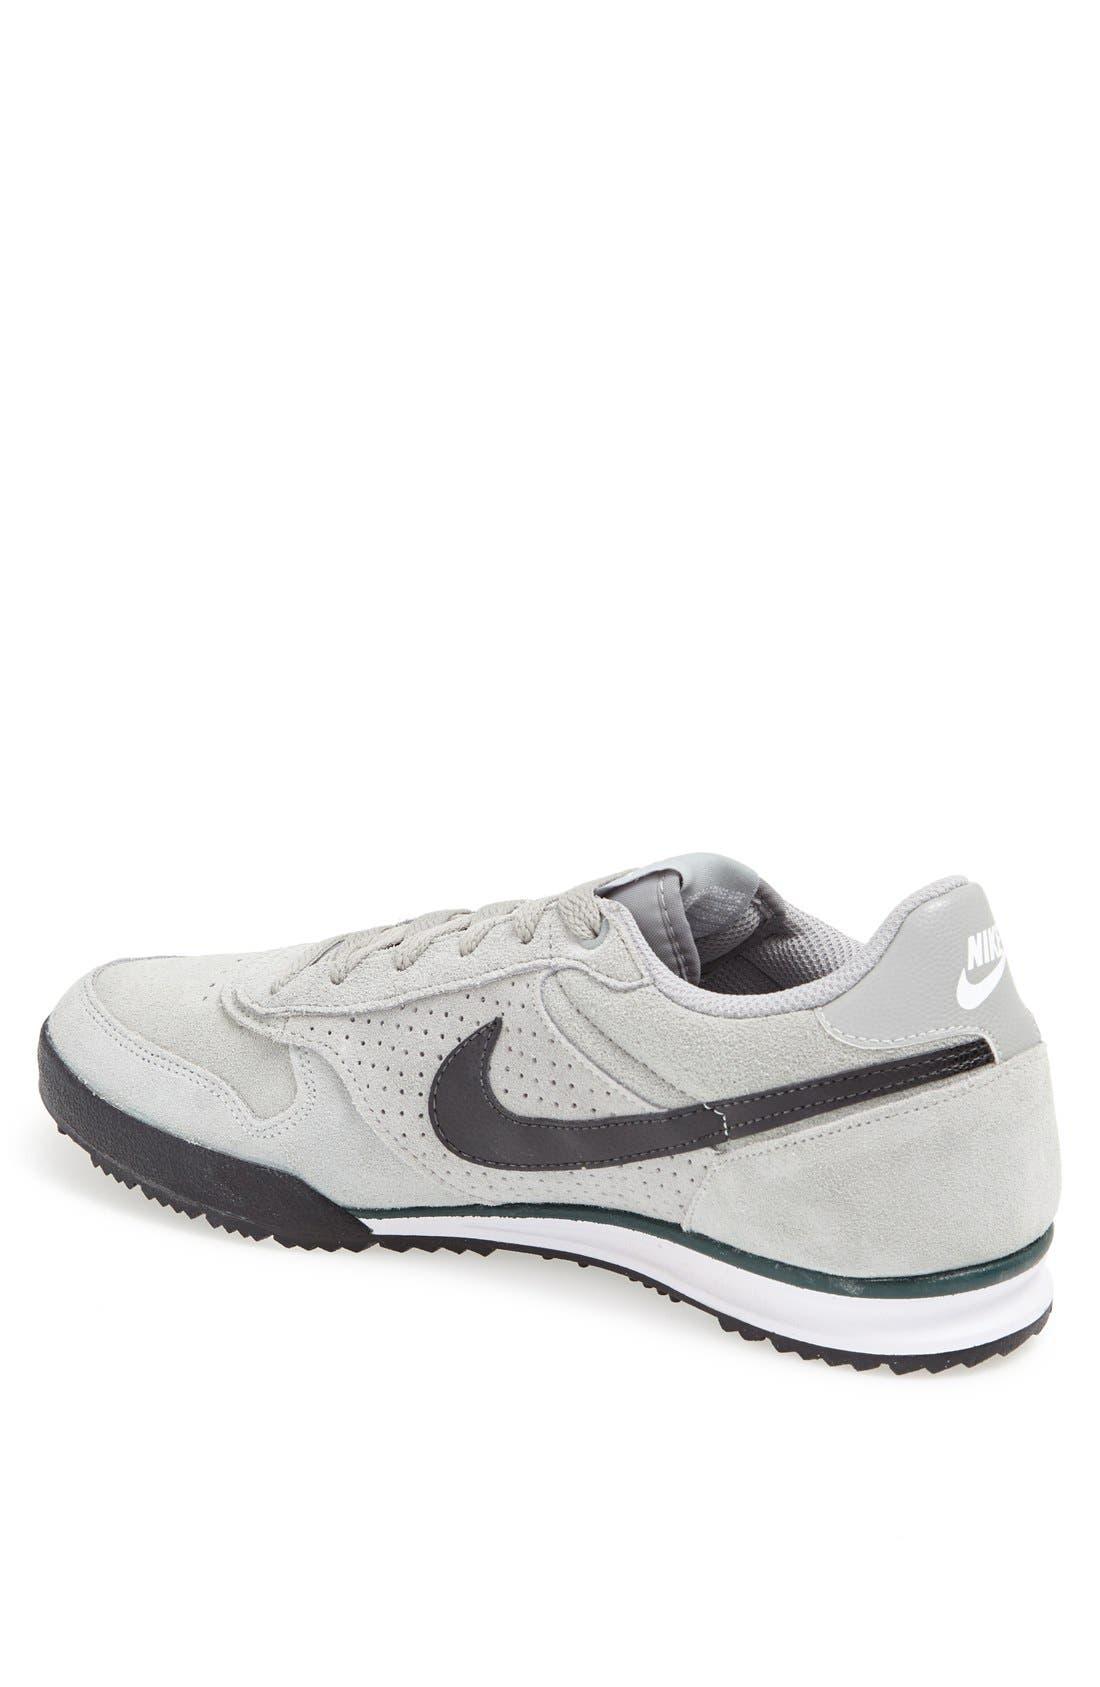 Alternate Image 2  - Nike 'Field Trainer' Sneaker (Men)